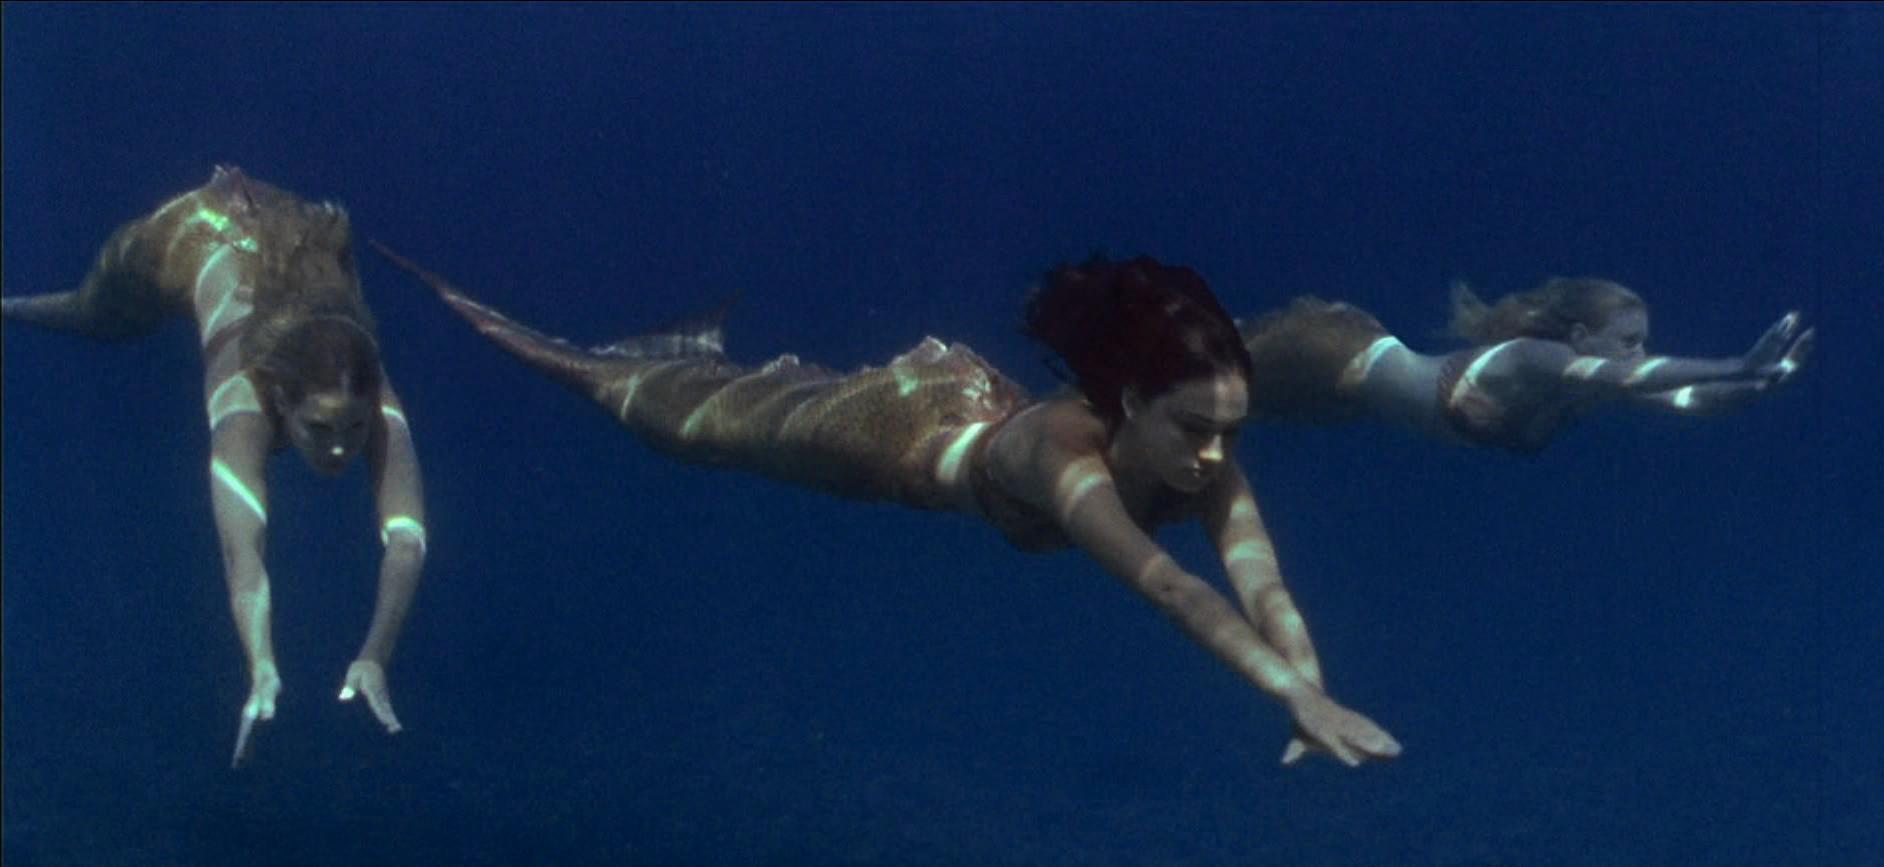 Real Alive Mermaids Body Found | newhairstylesformen2014.com